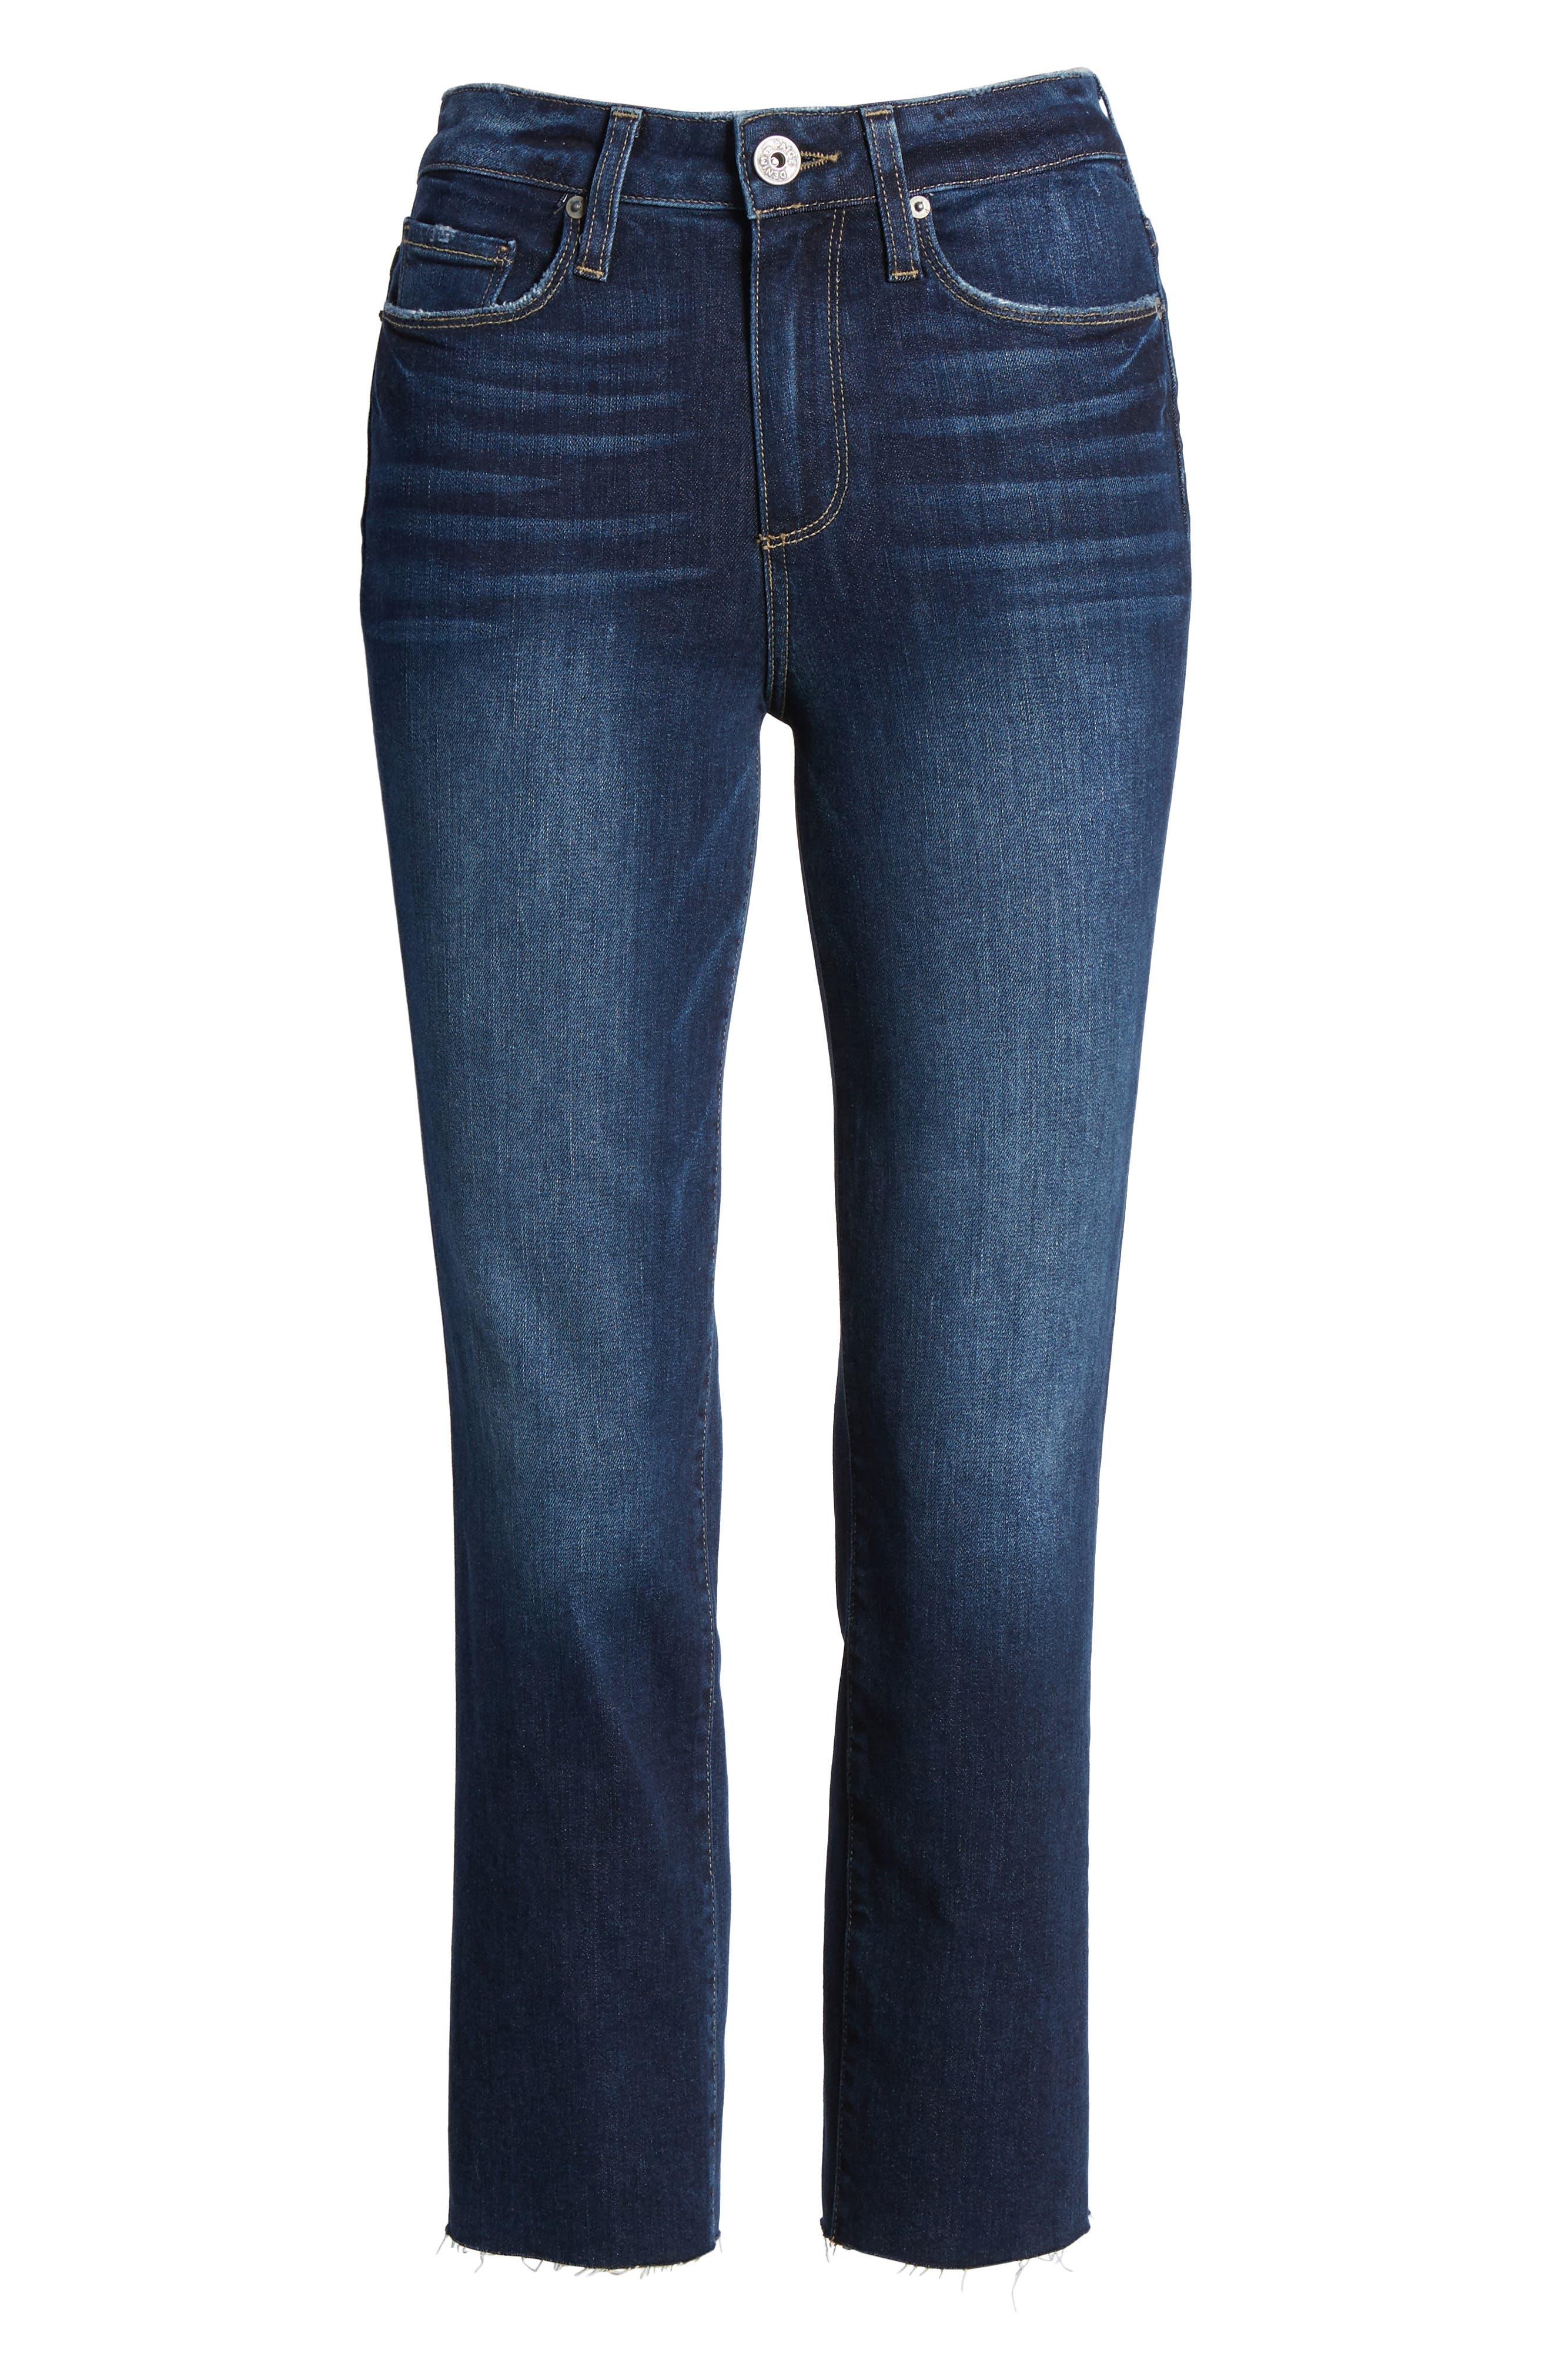 Hoxton Transcend Vintage High Waist Crop Straight Leg Jeans,                             Alternate thumbnail 6, color,                             400